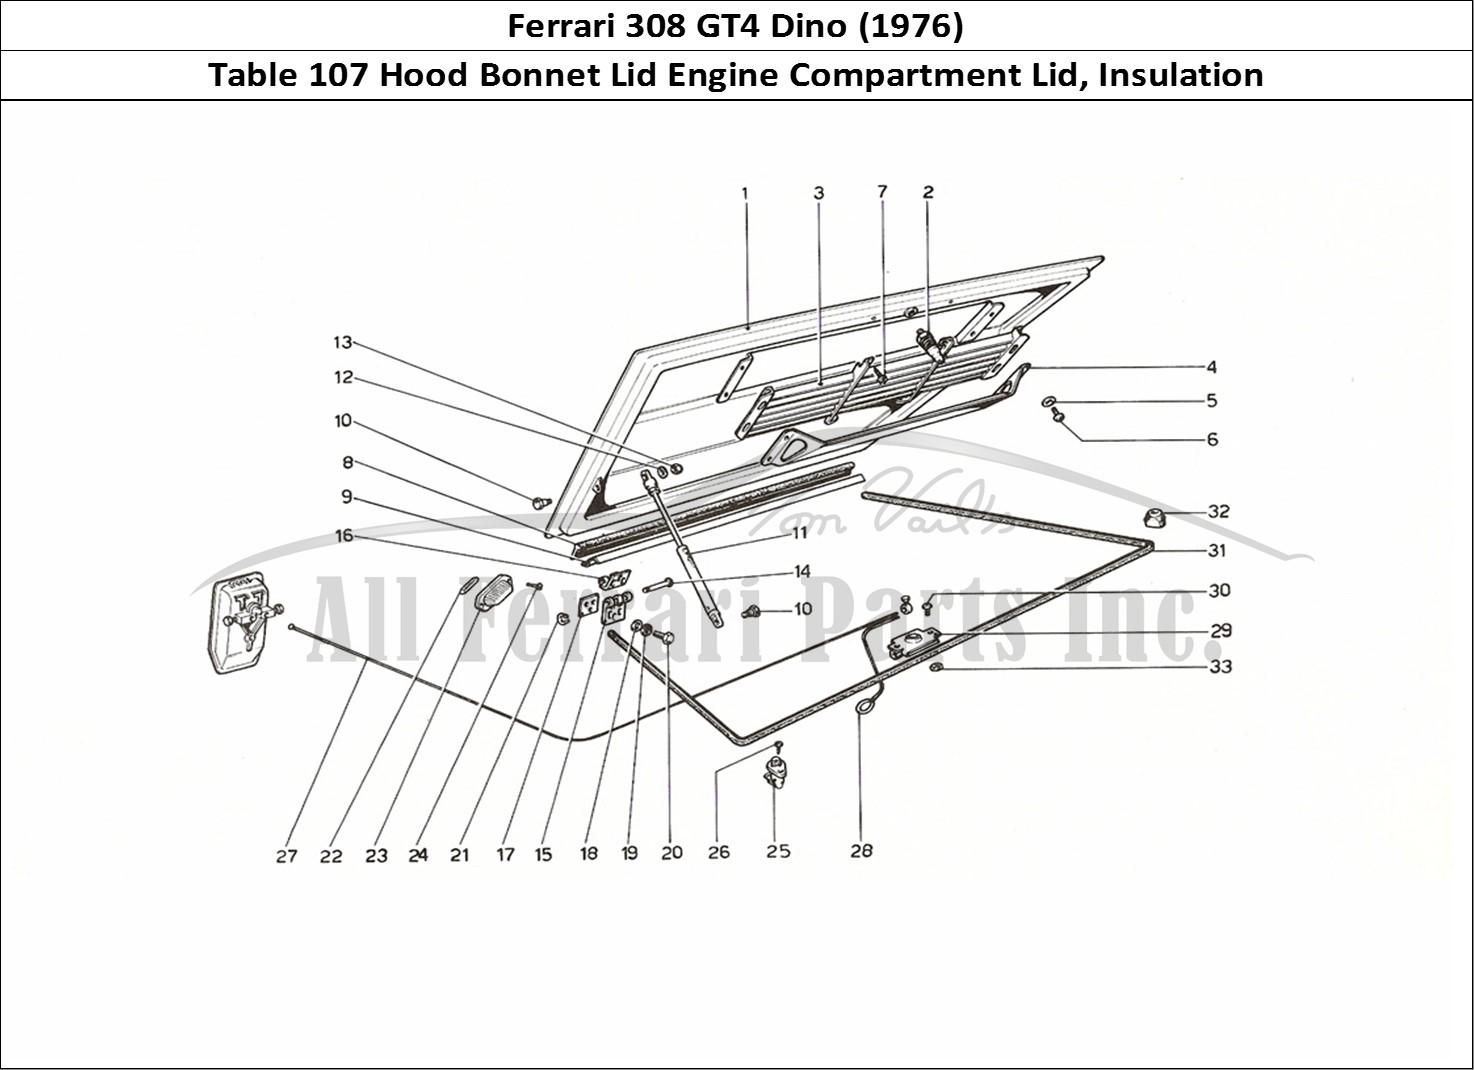 Buy Original Ferrari 308 Gt4 Dino 107 Hood Bonnet Lid Engine Compartment Lid Insulation